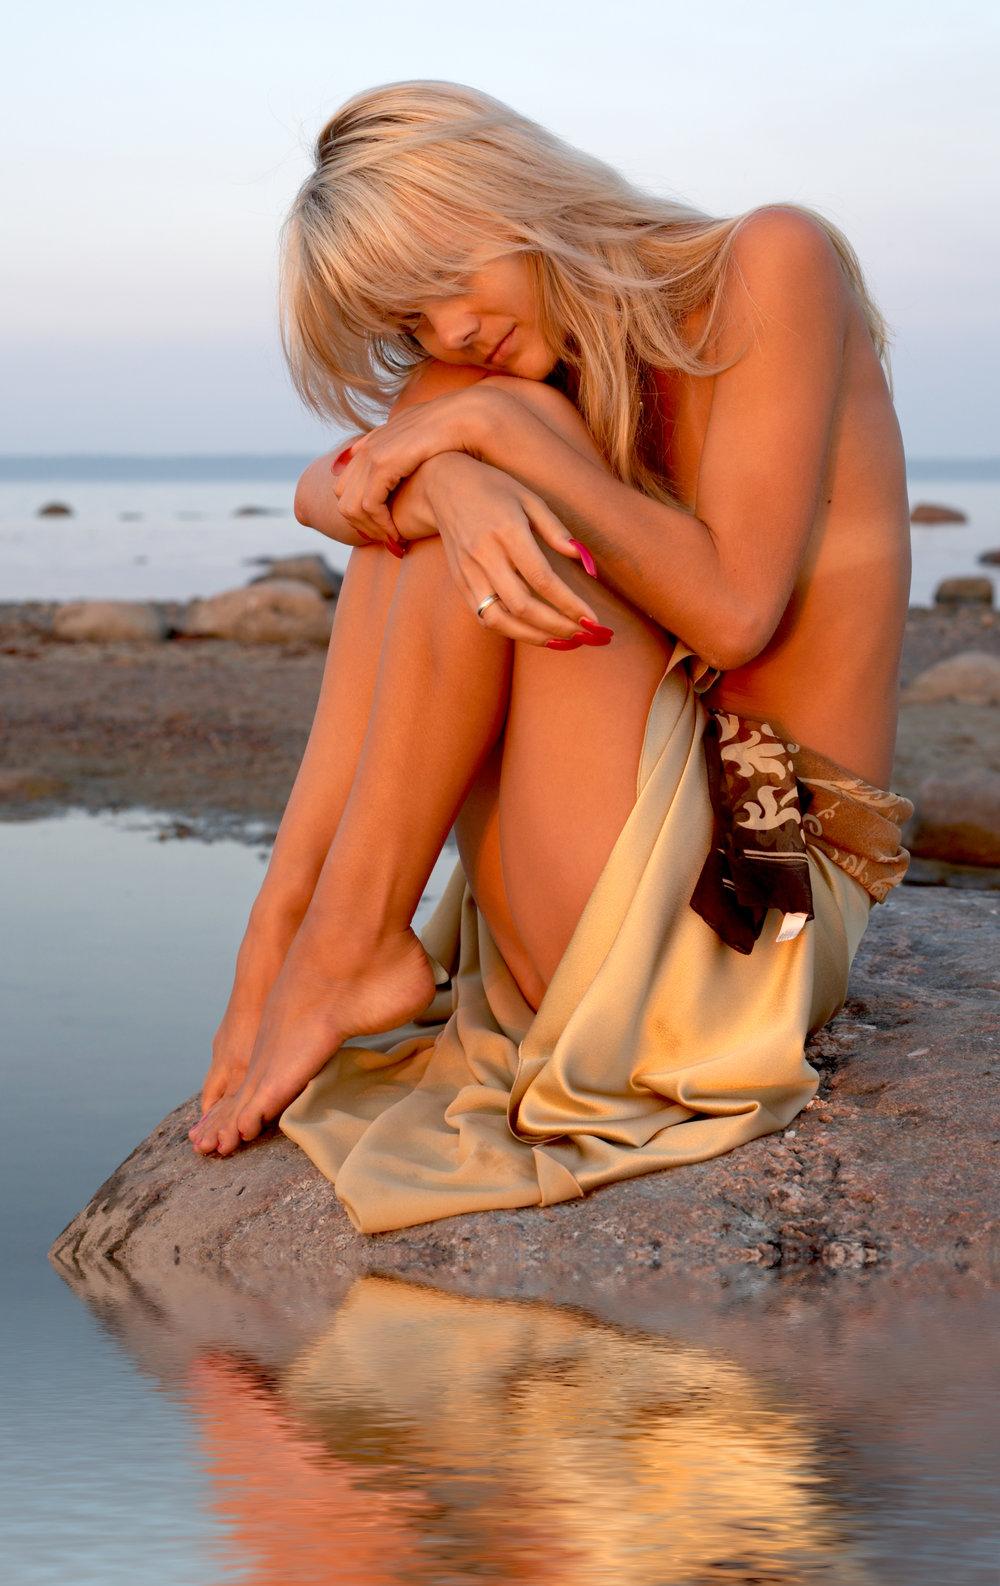 Image 4  Beach Girl.jpg